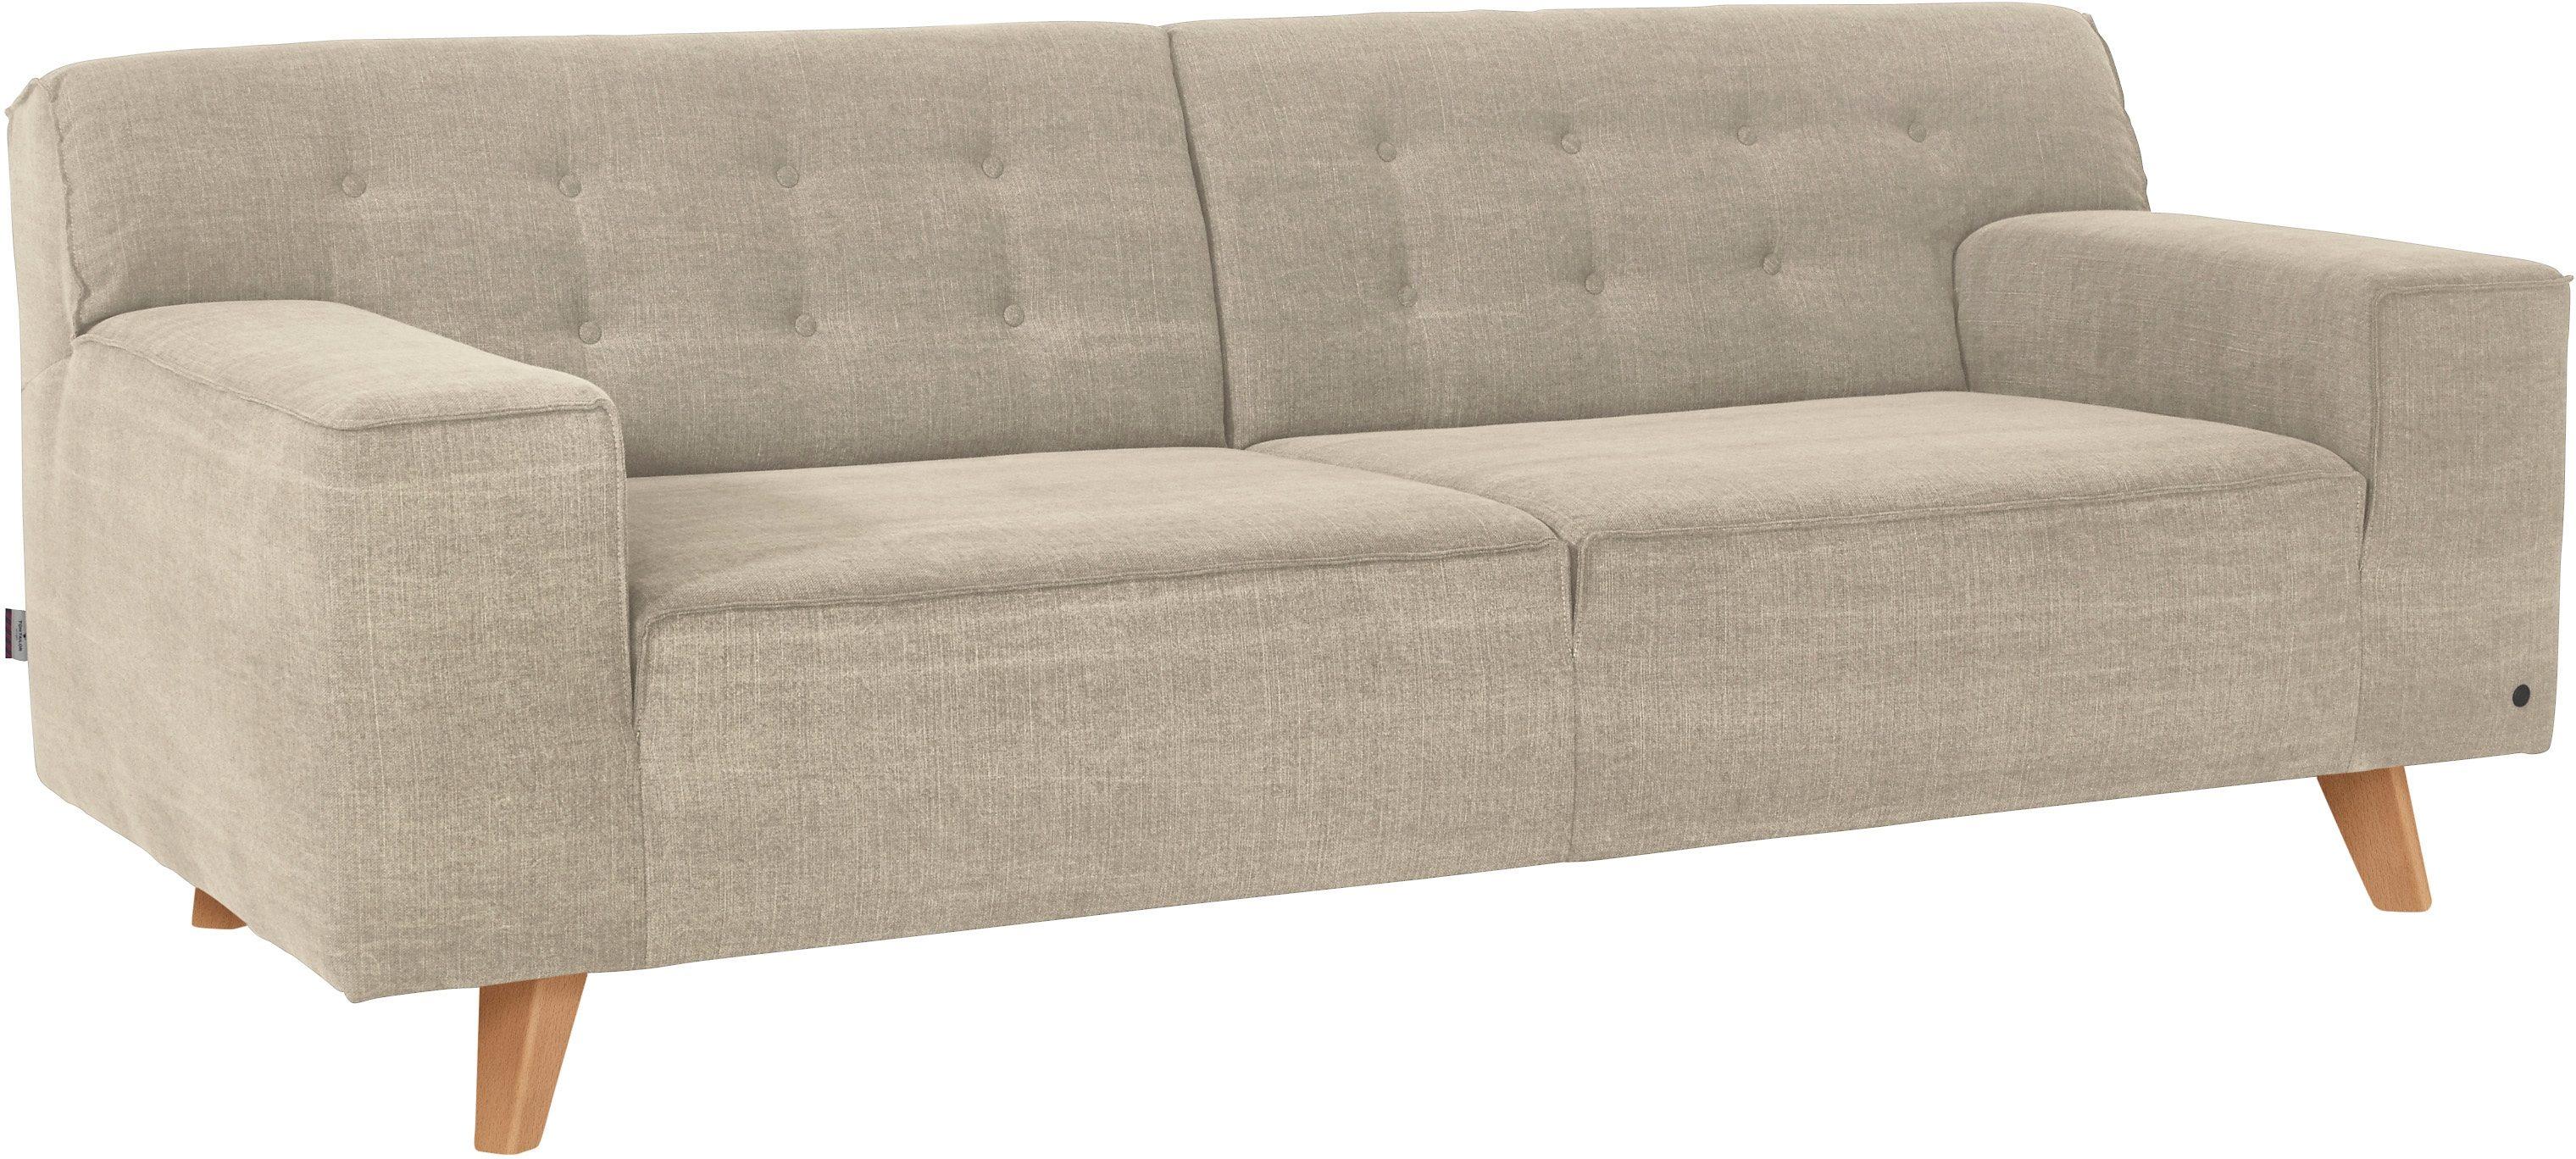 TOM TAILOR 2-Sitzer Sofa »NORDIC CHIC« im Retrolook, Füße Buche natur